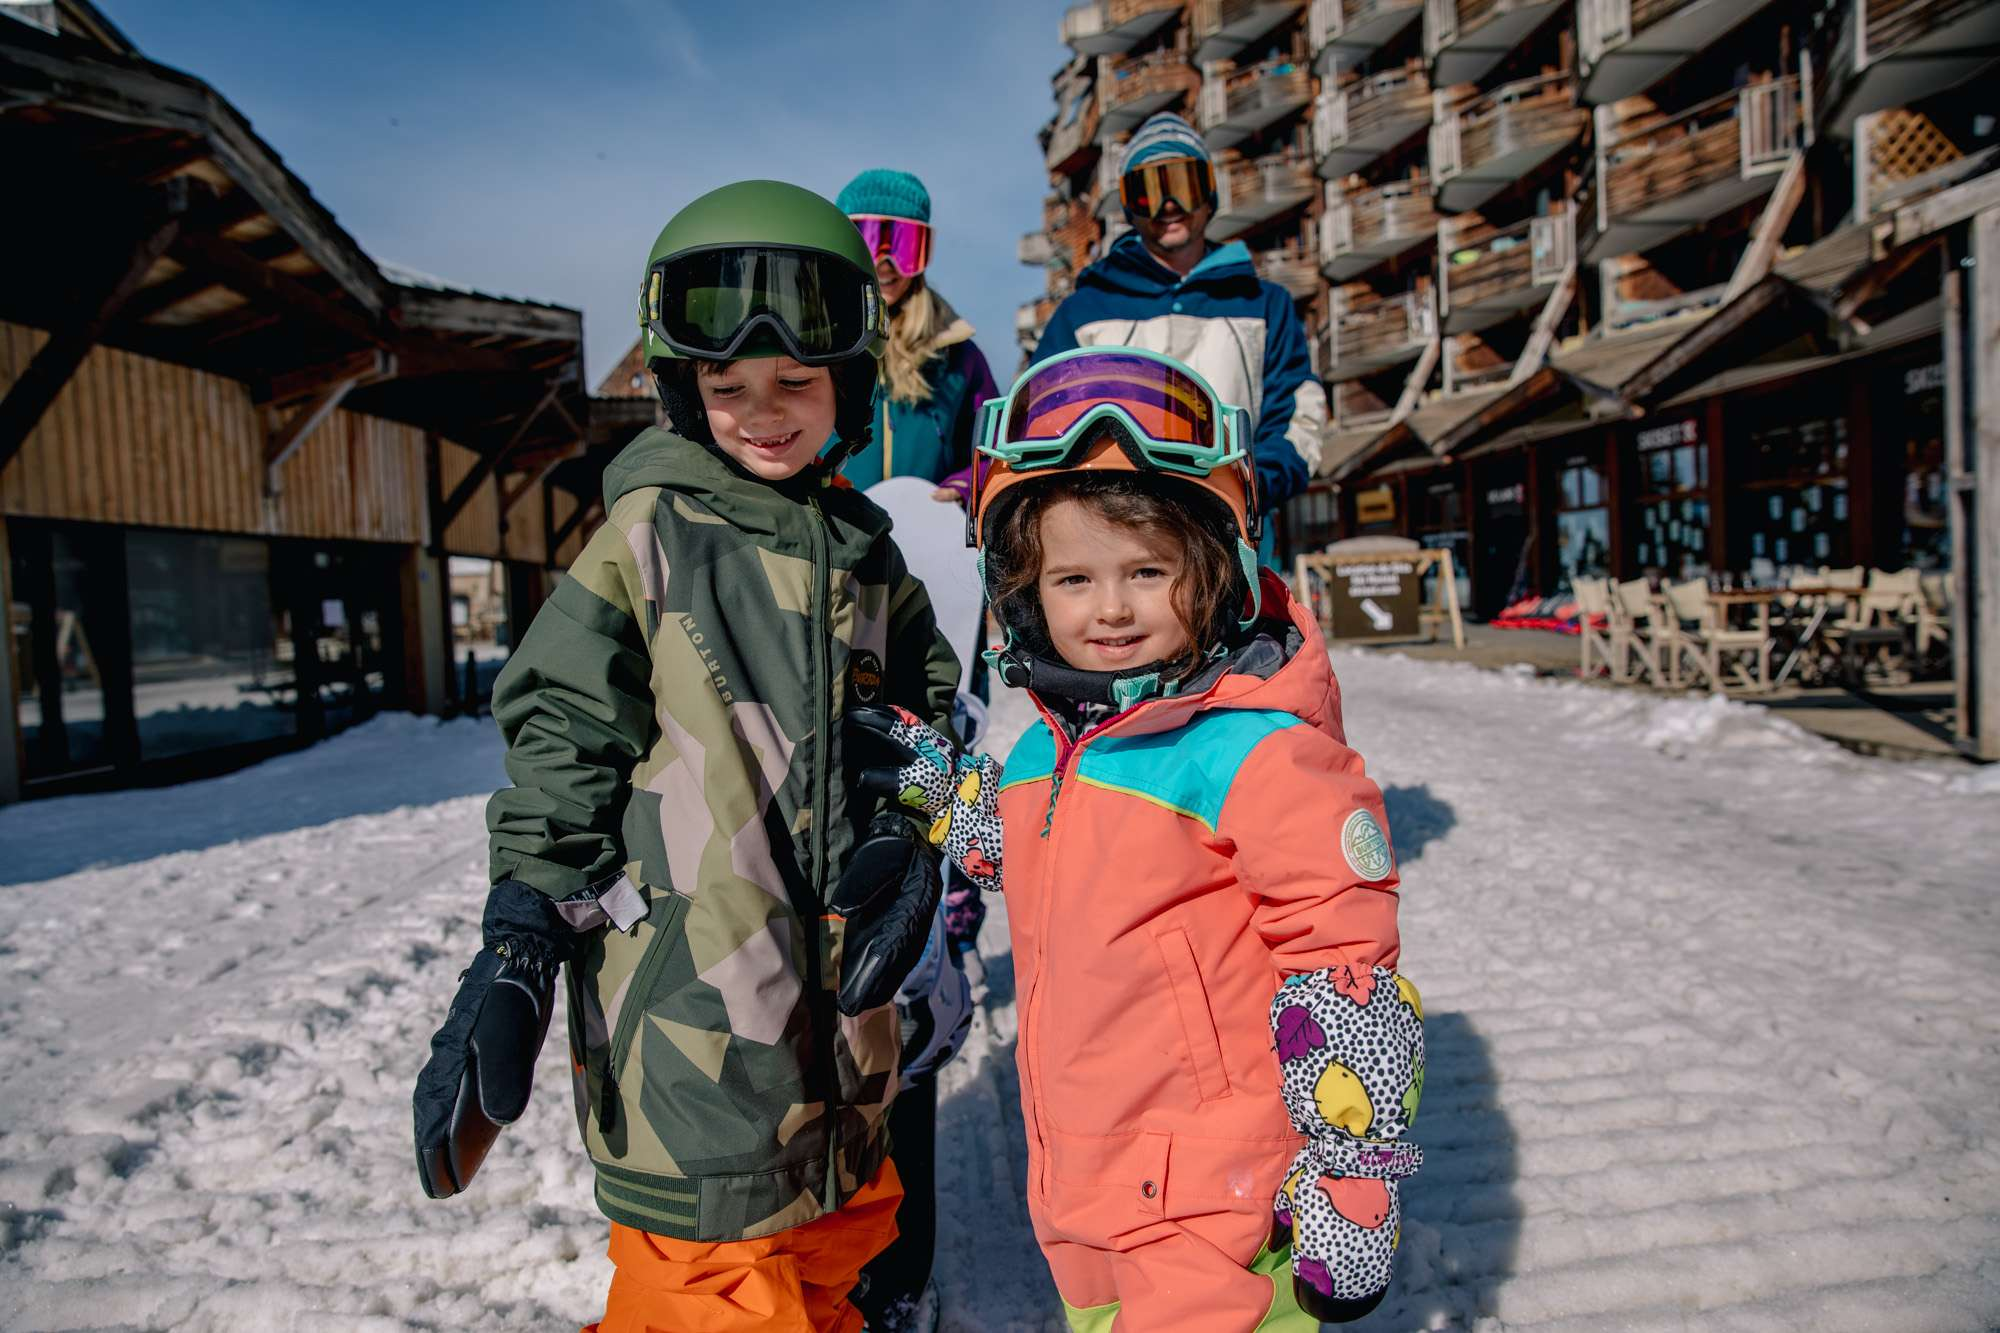 Burton Family Shoot - Avoriaz - 2019